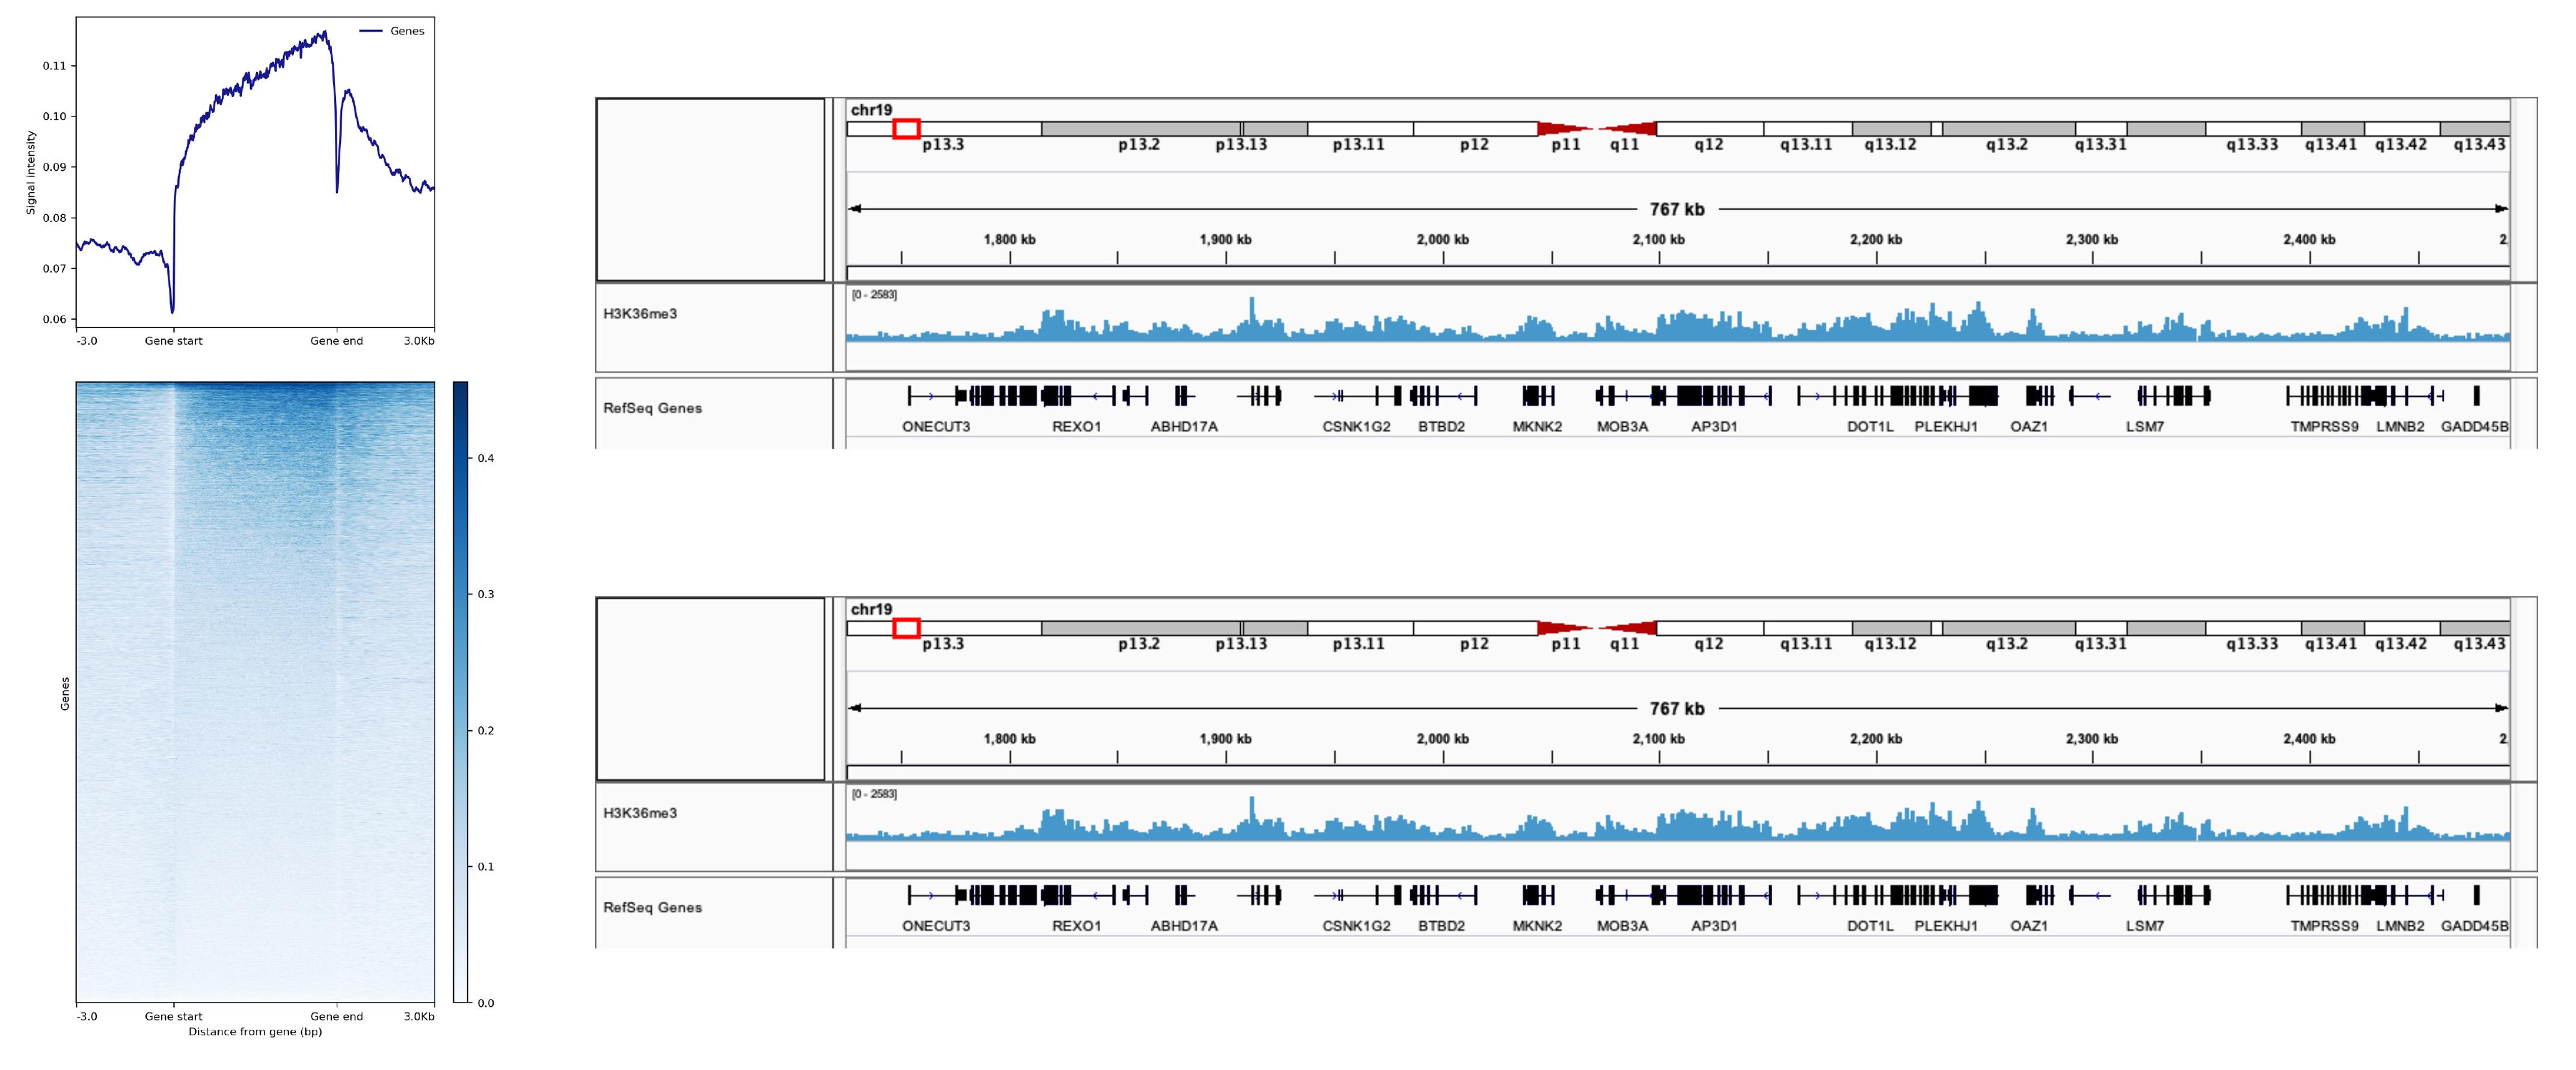 13-0031 Representative SNAP-ChIP-seq results: